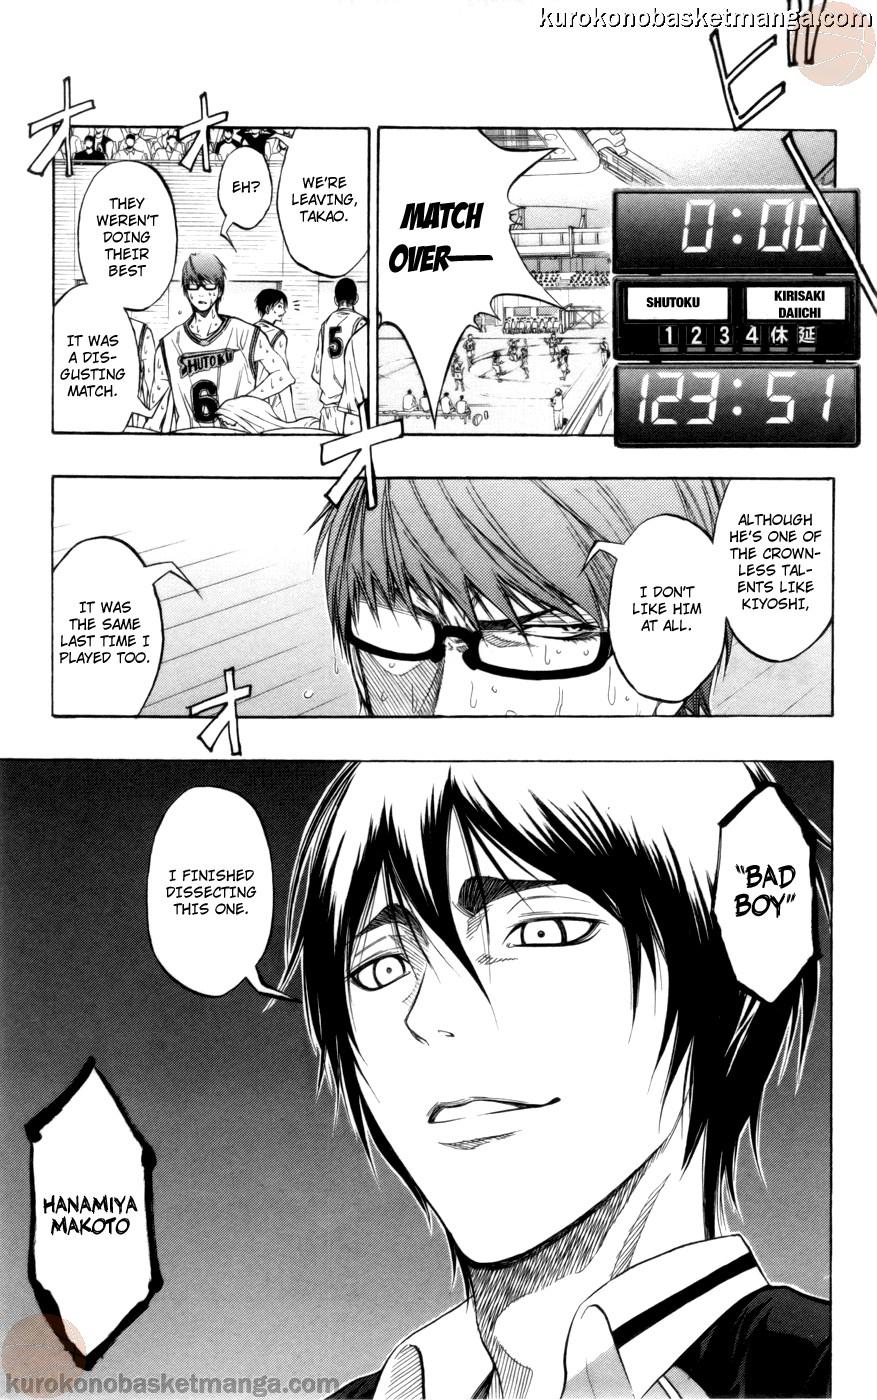 Kuroko no Basket Manga Chapter 84 - Image 19